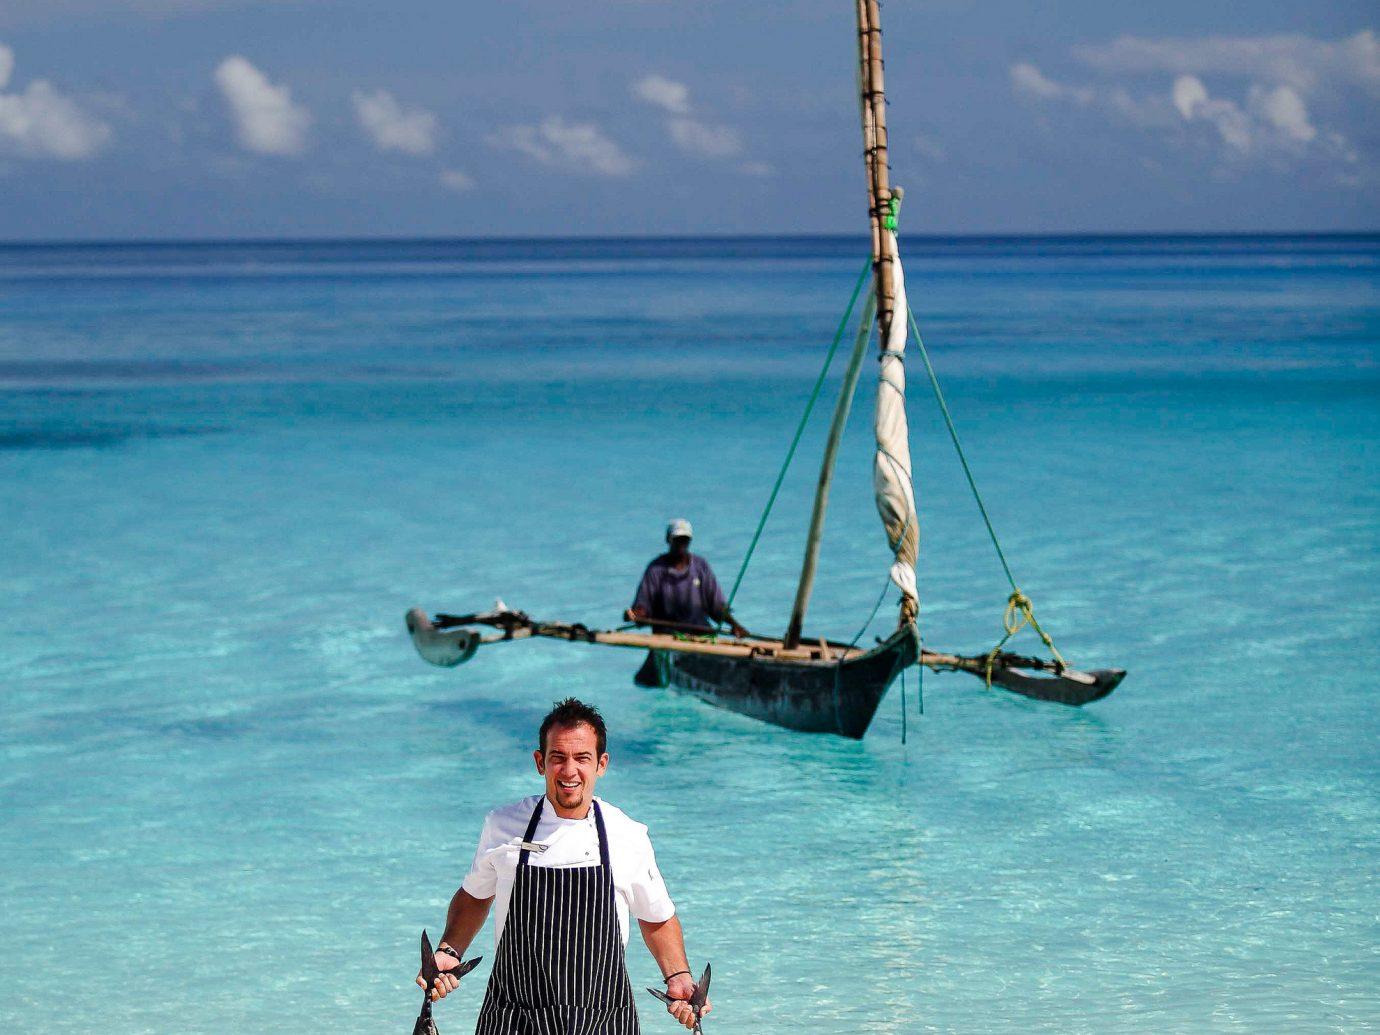 man bringing back fish from the ocean